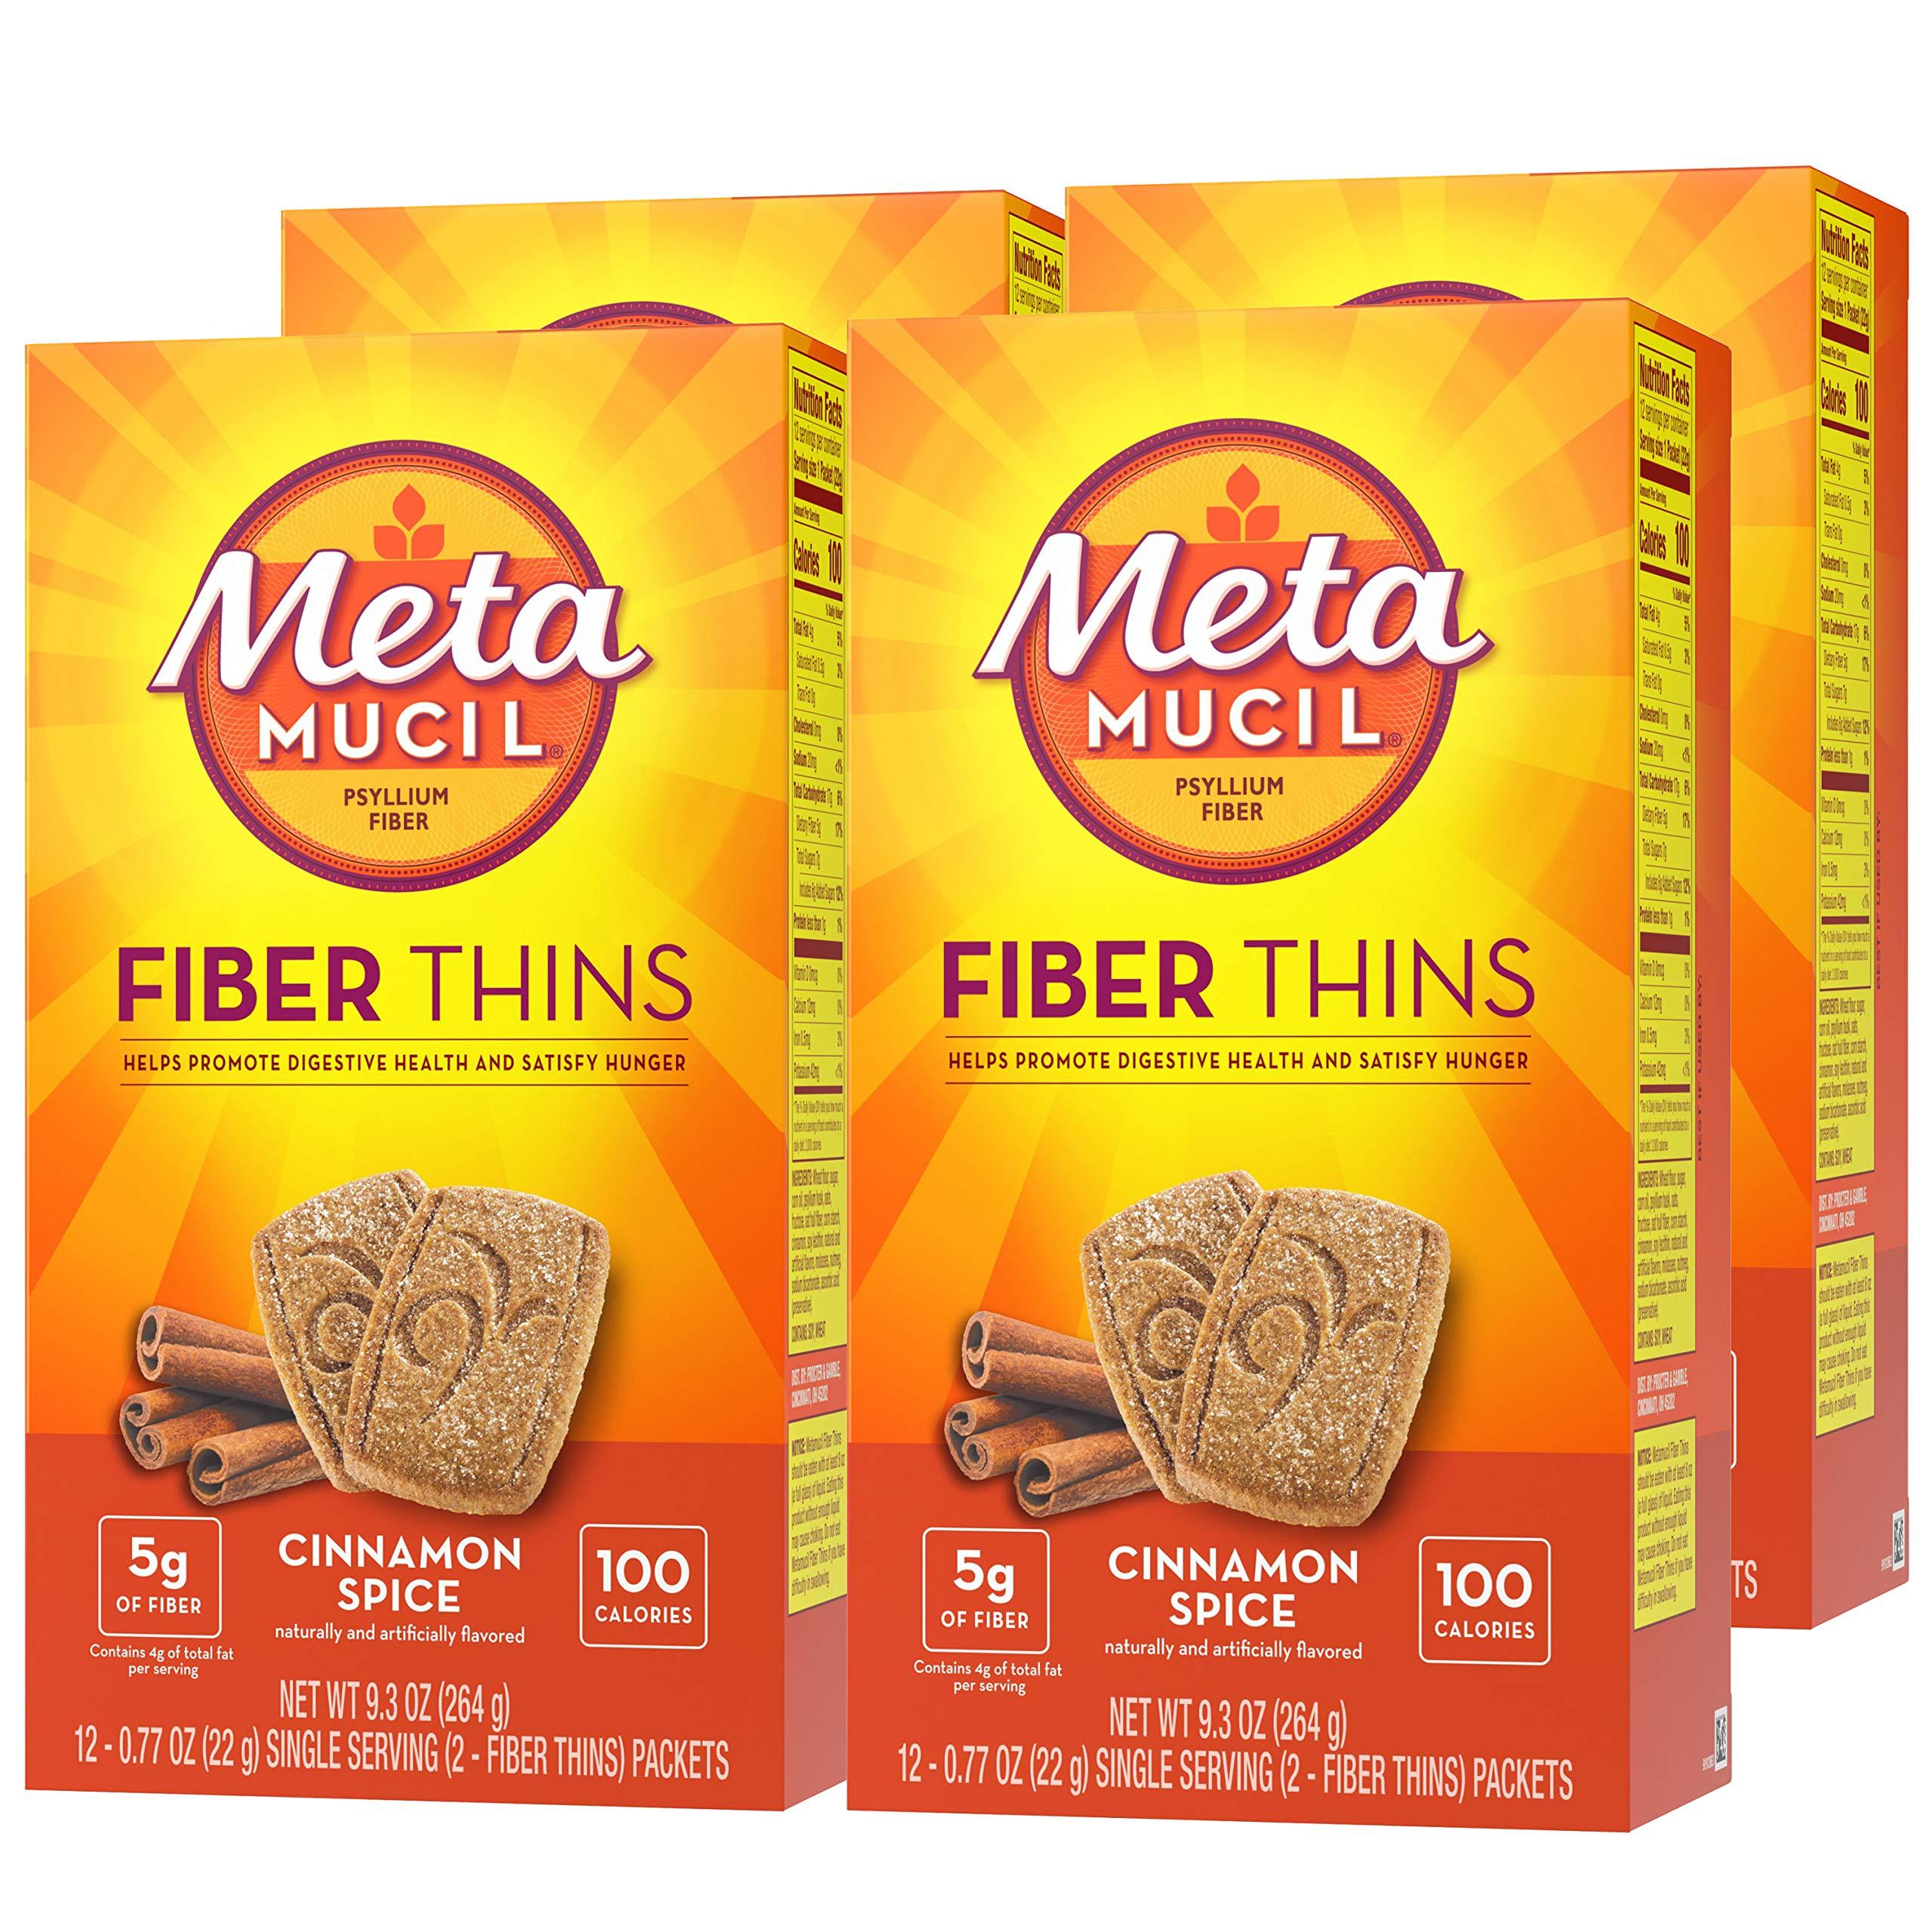 Metamucil Fiber Thins, Cinnamon Spice Flavored Dietary Fiber Supplement Snack with Psyllium Husk, 12 Servings (Pack of 4) by Metamucil